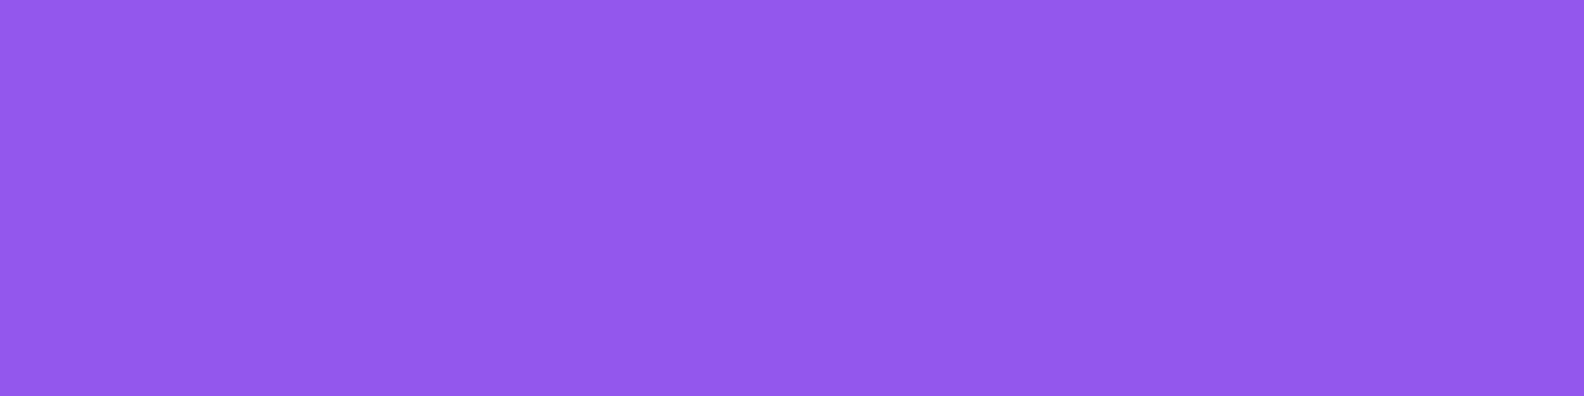 1584x396 Lavender Indigo Solid Color Background